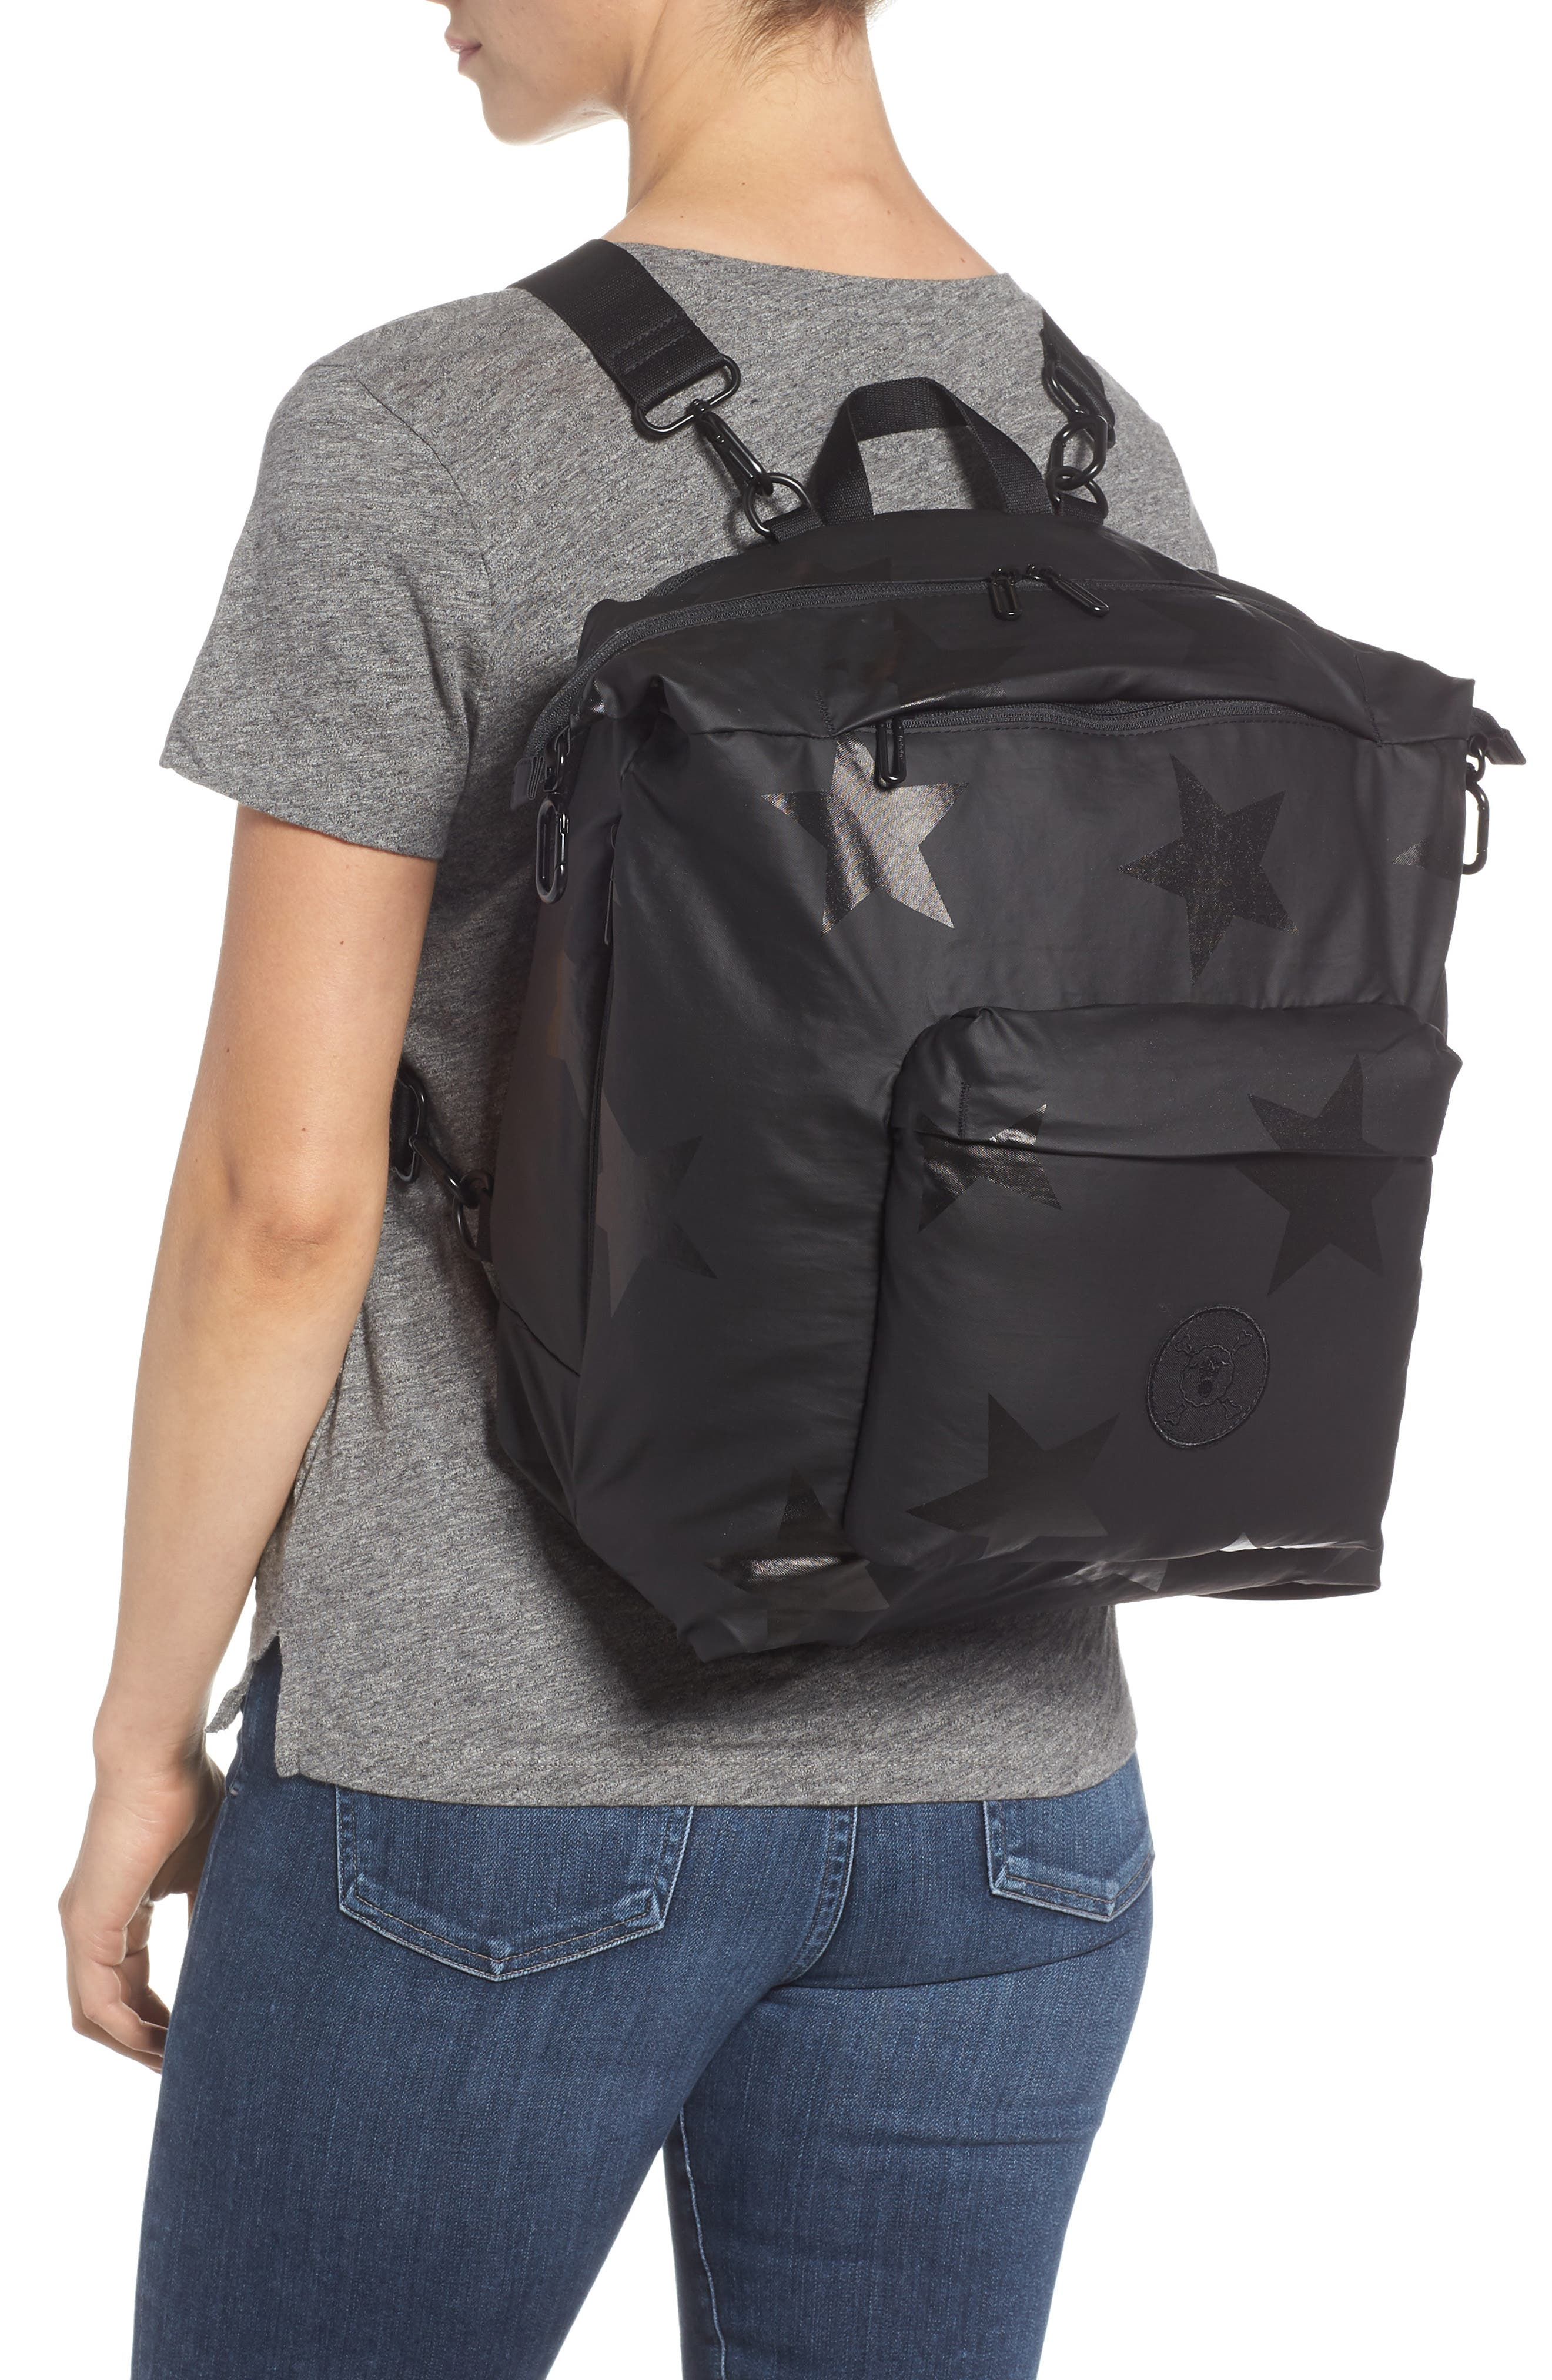 +one duo Nylon Convertible Diaper Bag,                             Alternate thumbnail 2, color,                             BLACK STAR